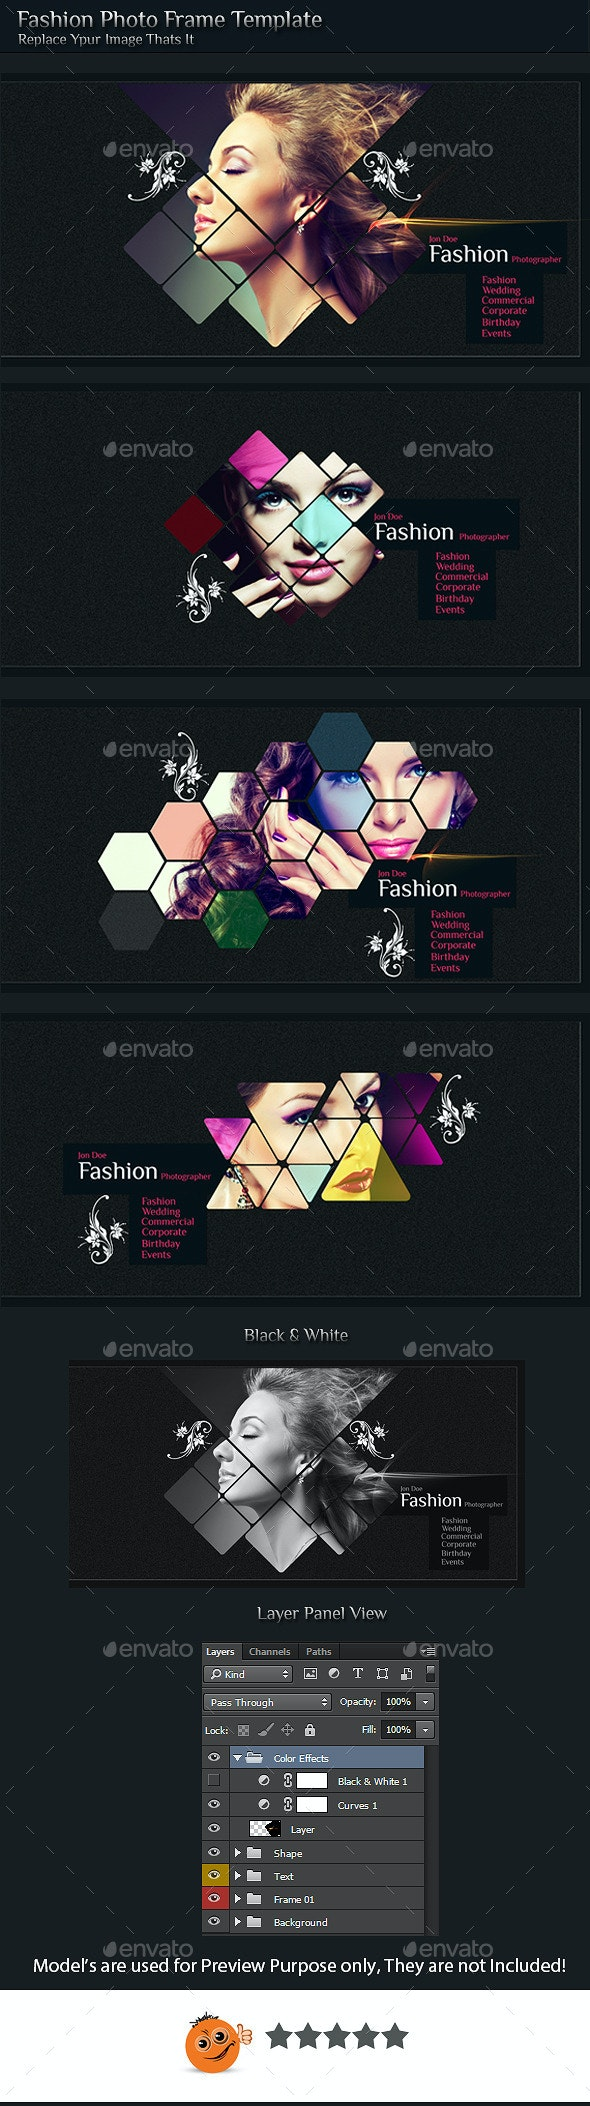 Fashion Photo Frame Template  - Photo Templates Graphics